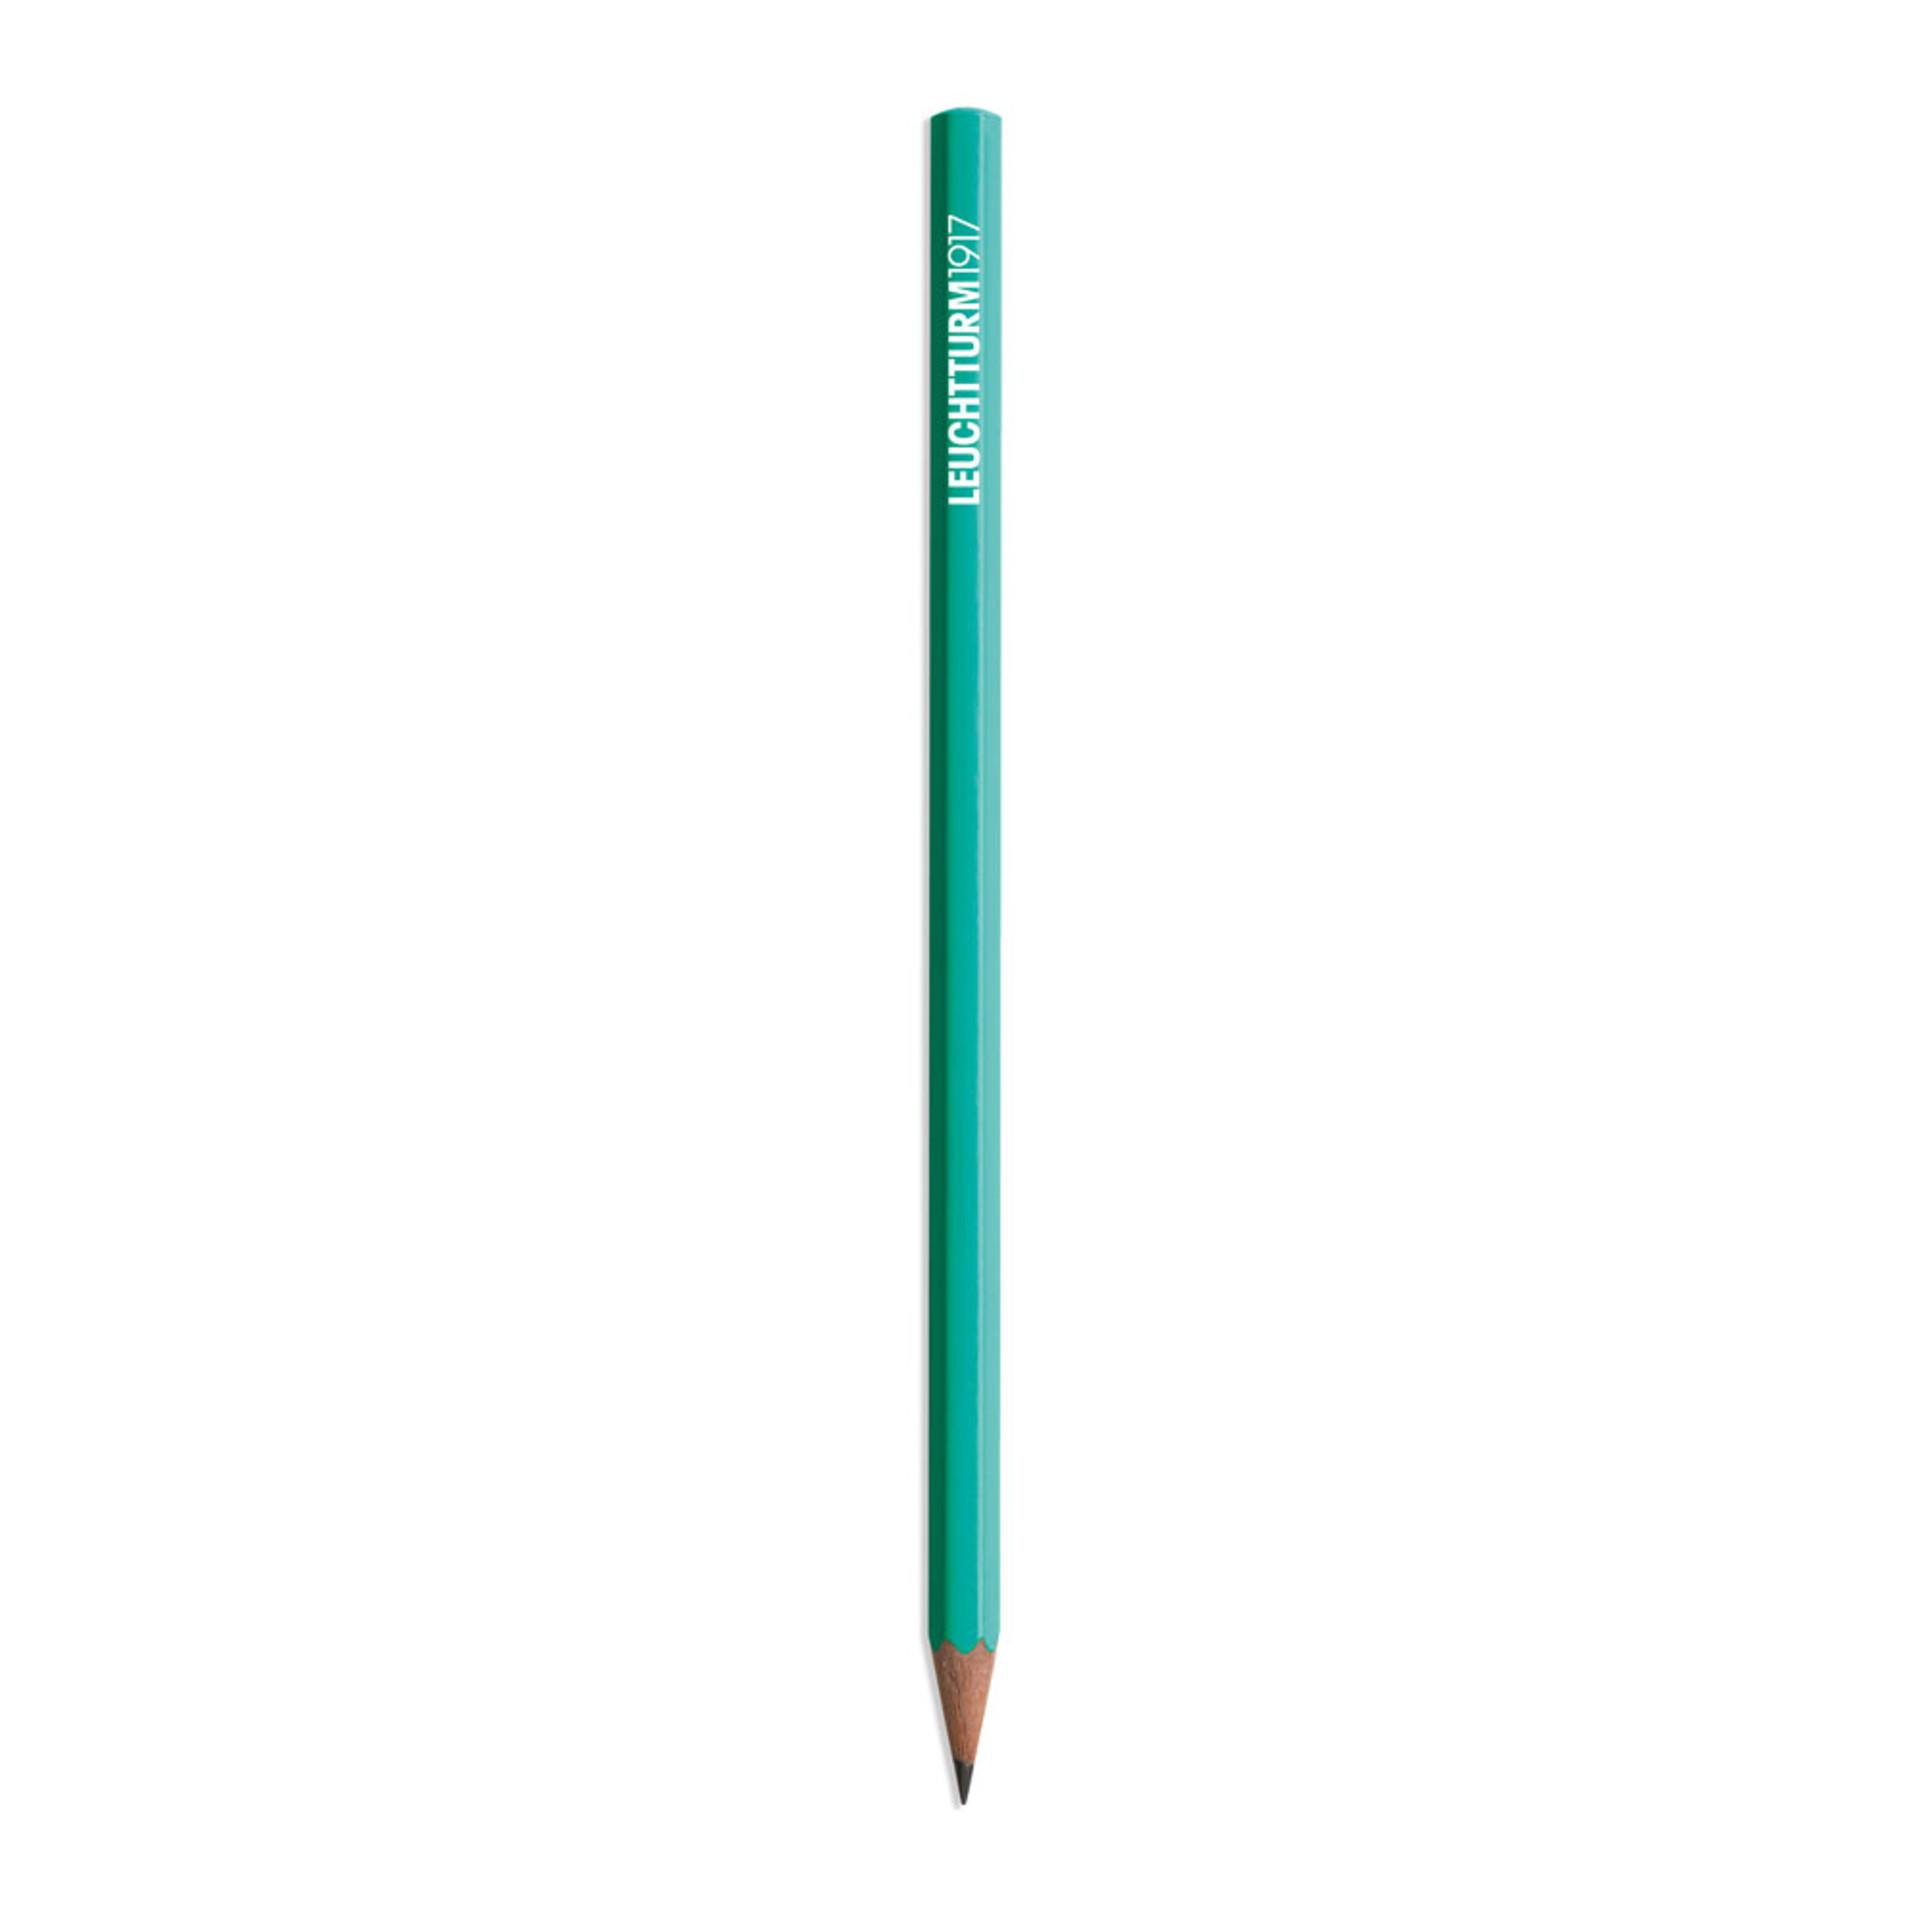 Leuchtturm 1917 Black HB Lead Woodcase Pencil – Emerald